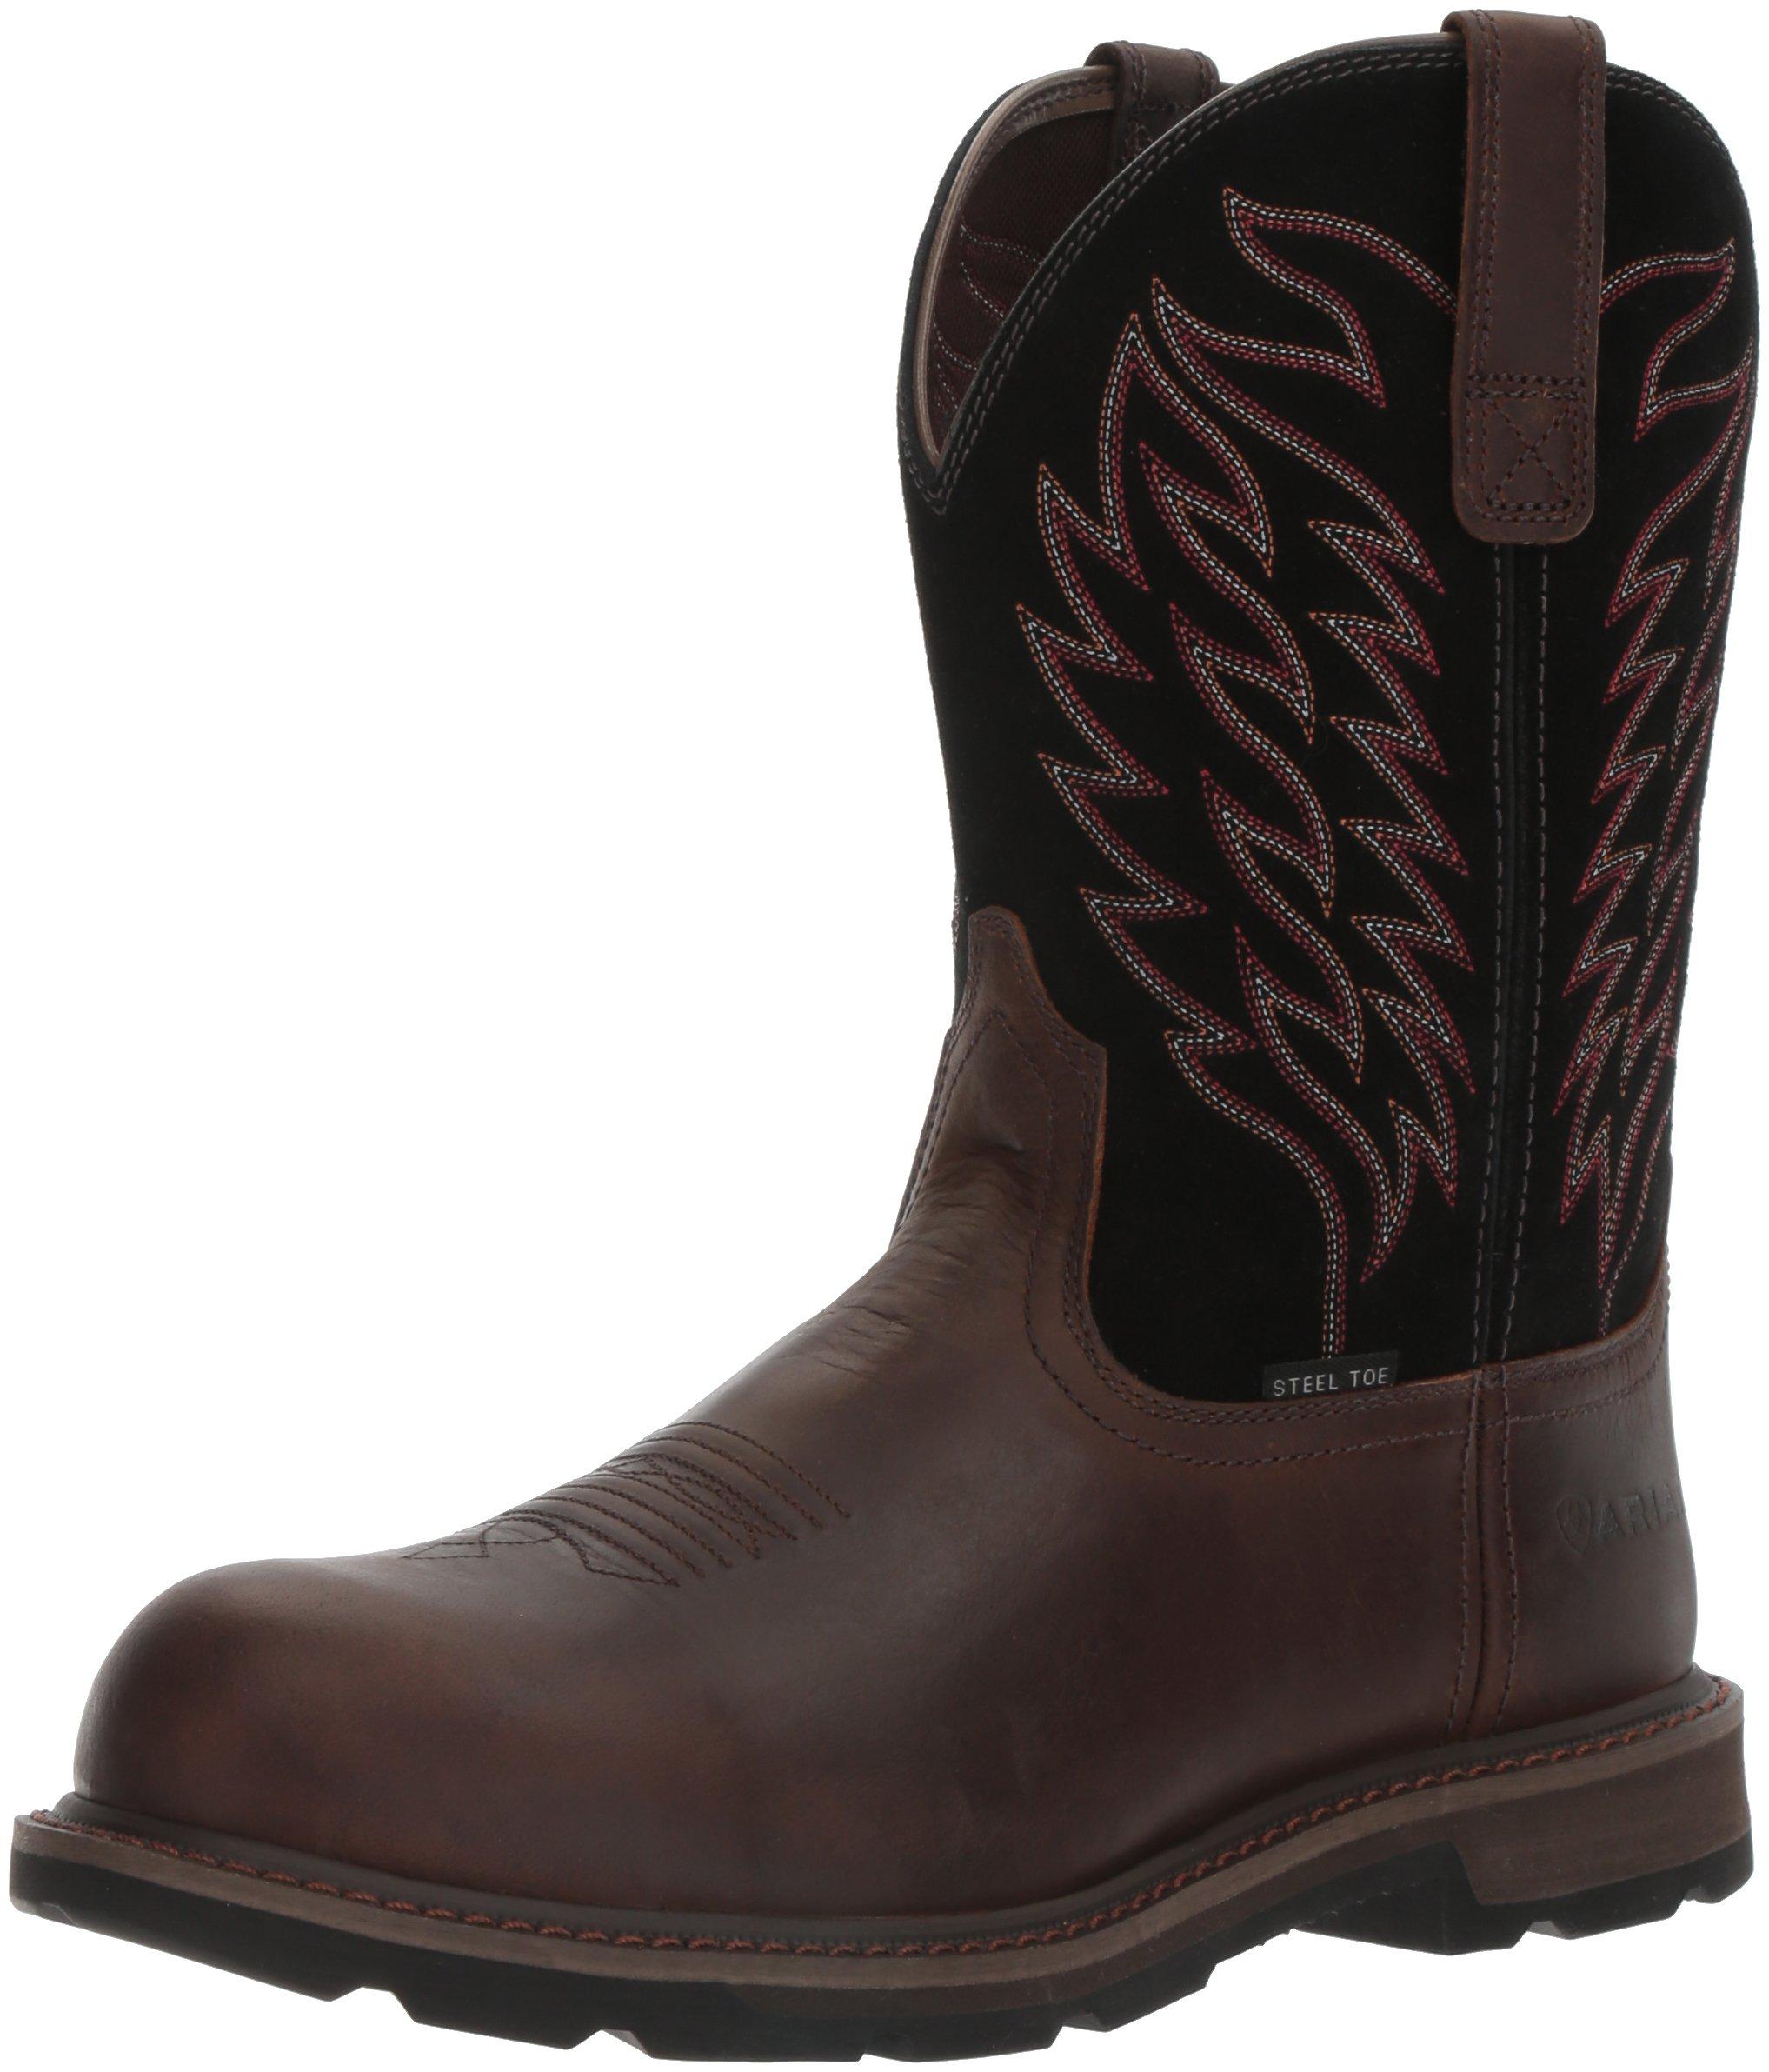 Ariat Work Men's Groundbreaker Pull-On Steel Toe Work Boot, Brown/Black, 9.5 D US